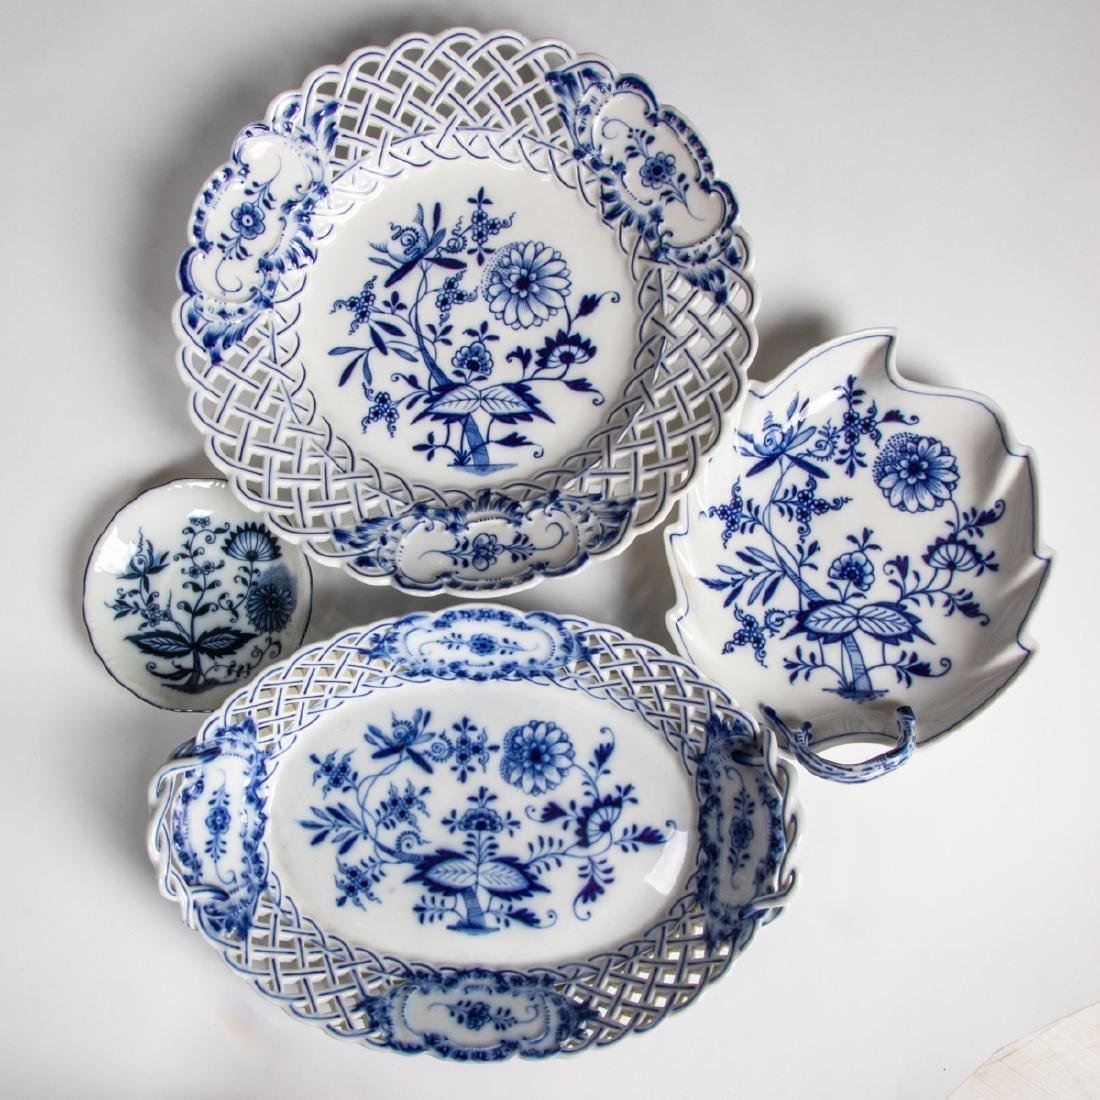 A Meissen Porcelain Dinner Service in the Blue Onion - 9